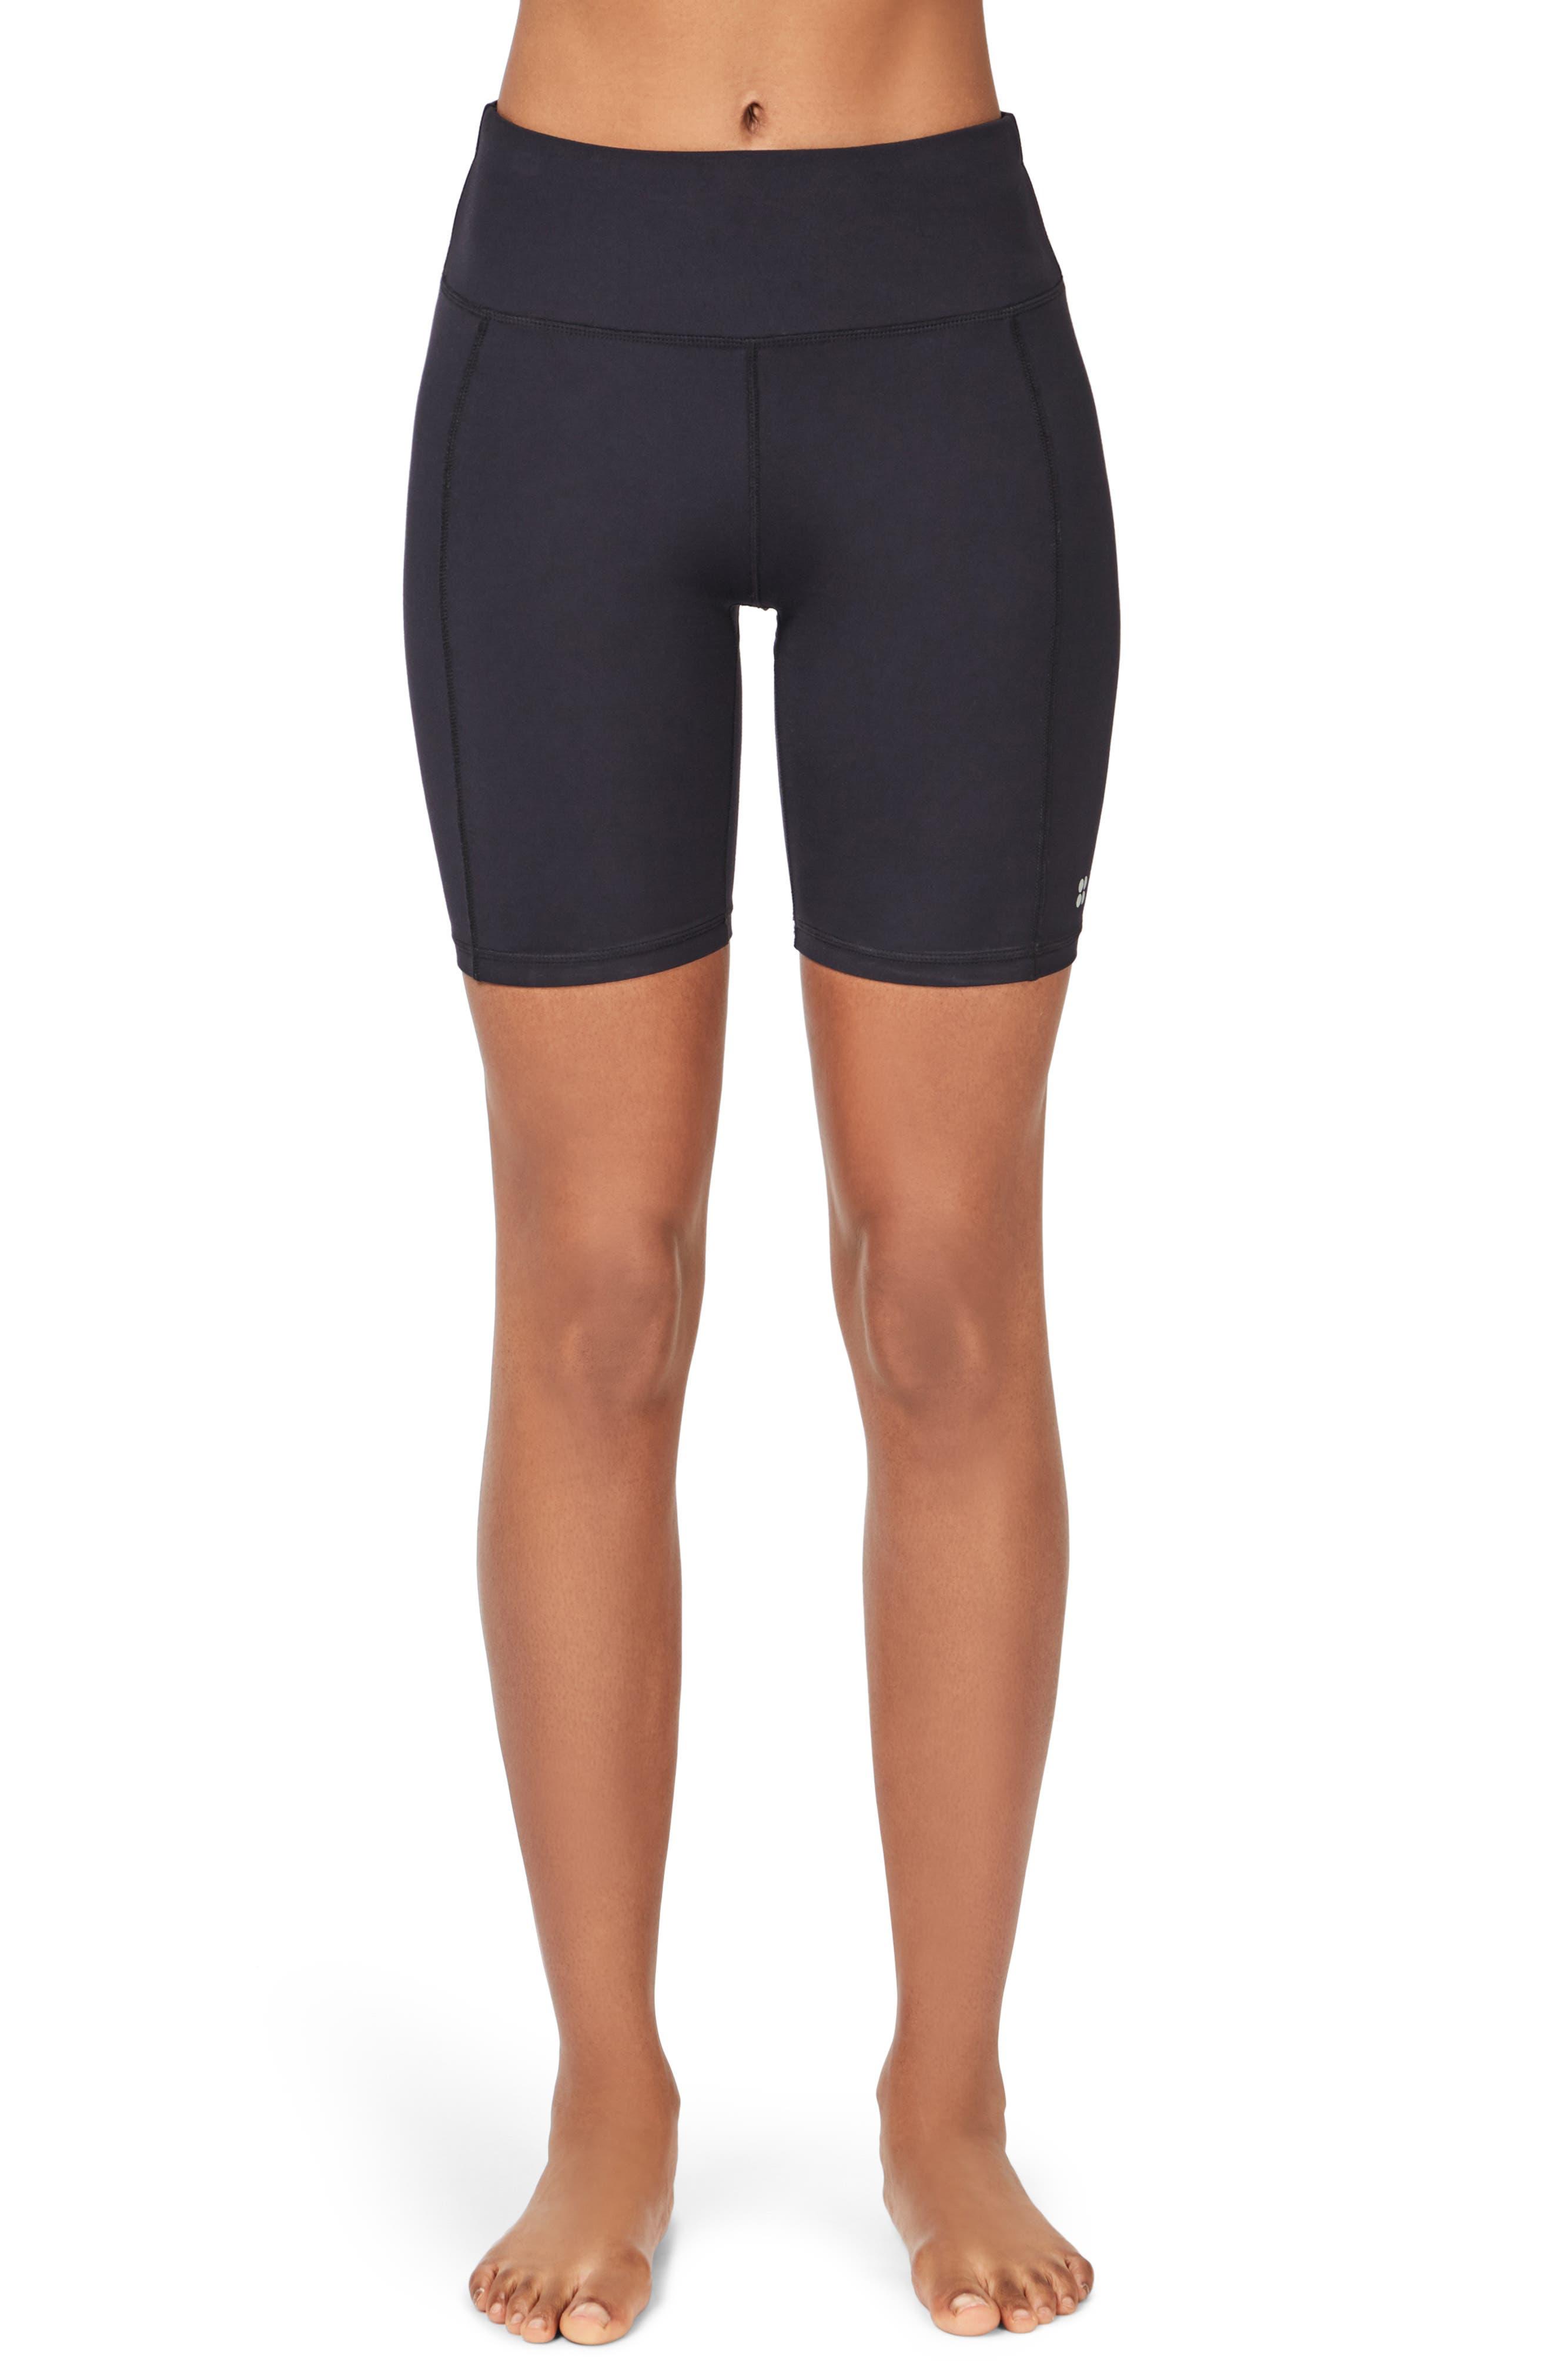 Women's Sweaty Betty Contour Workout Shorts